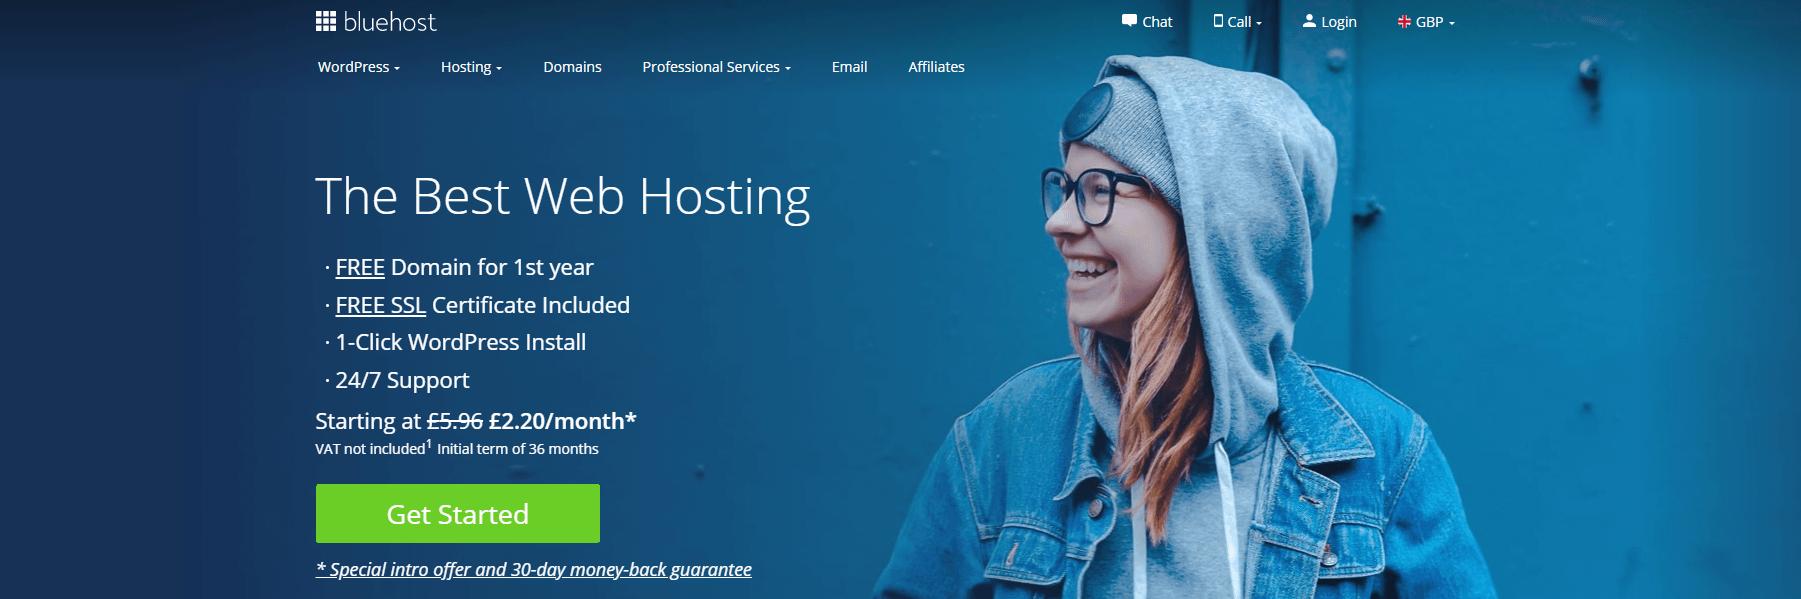 Bluehost主页。